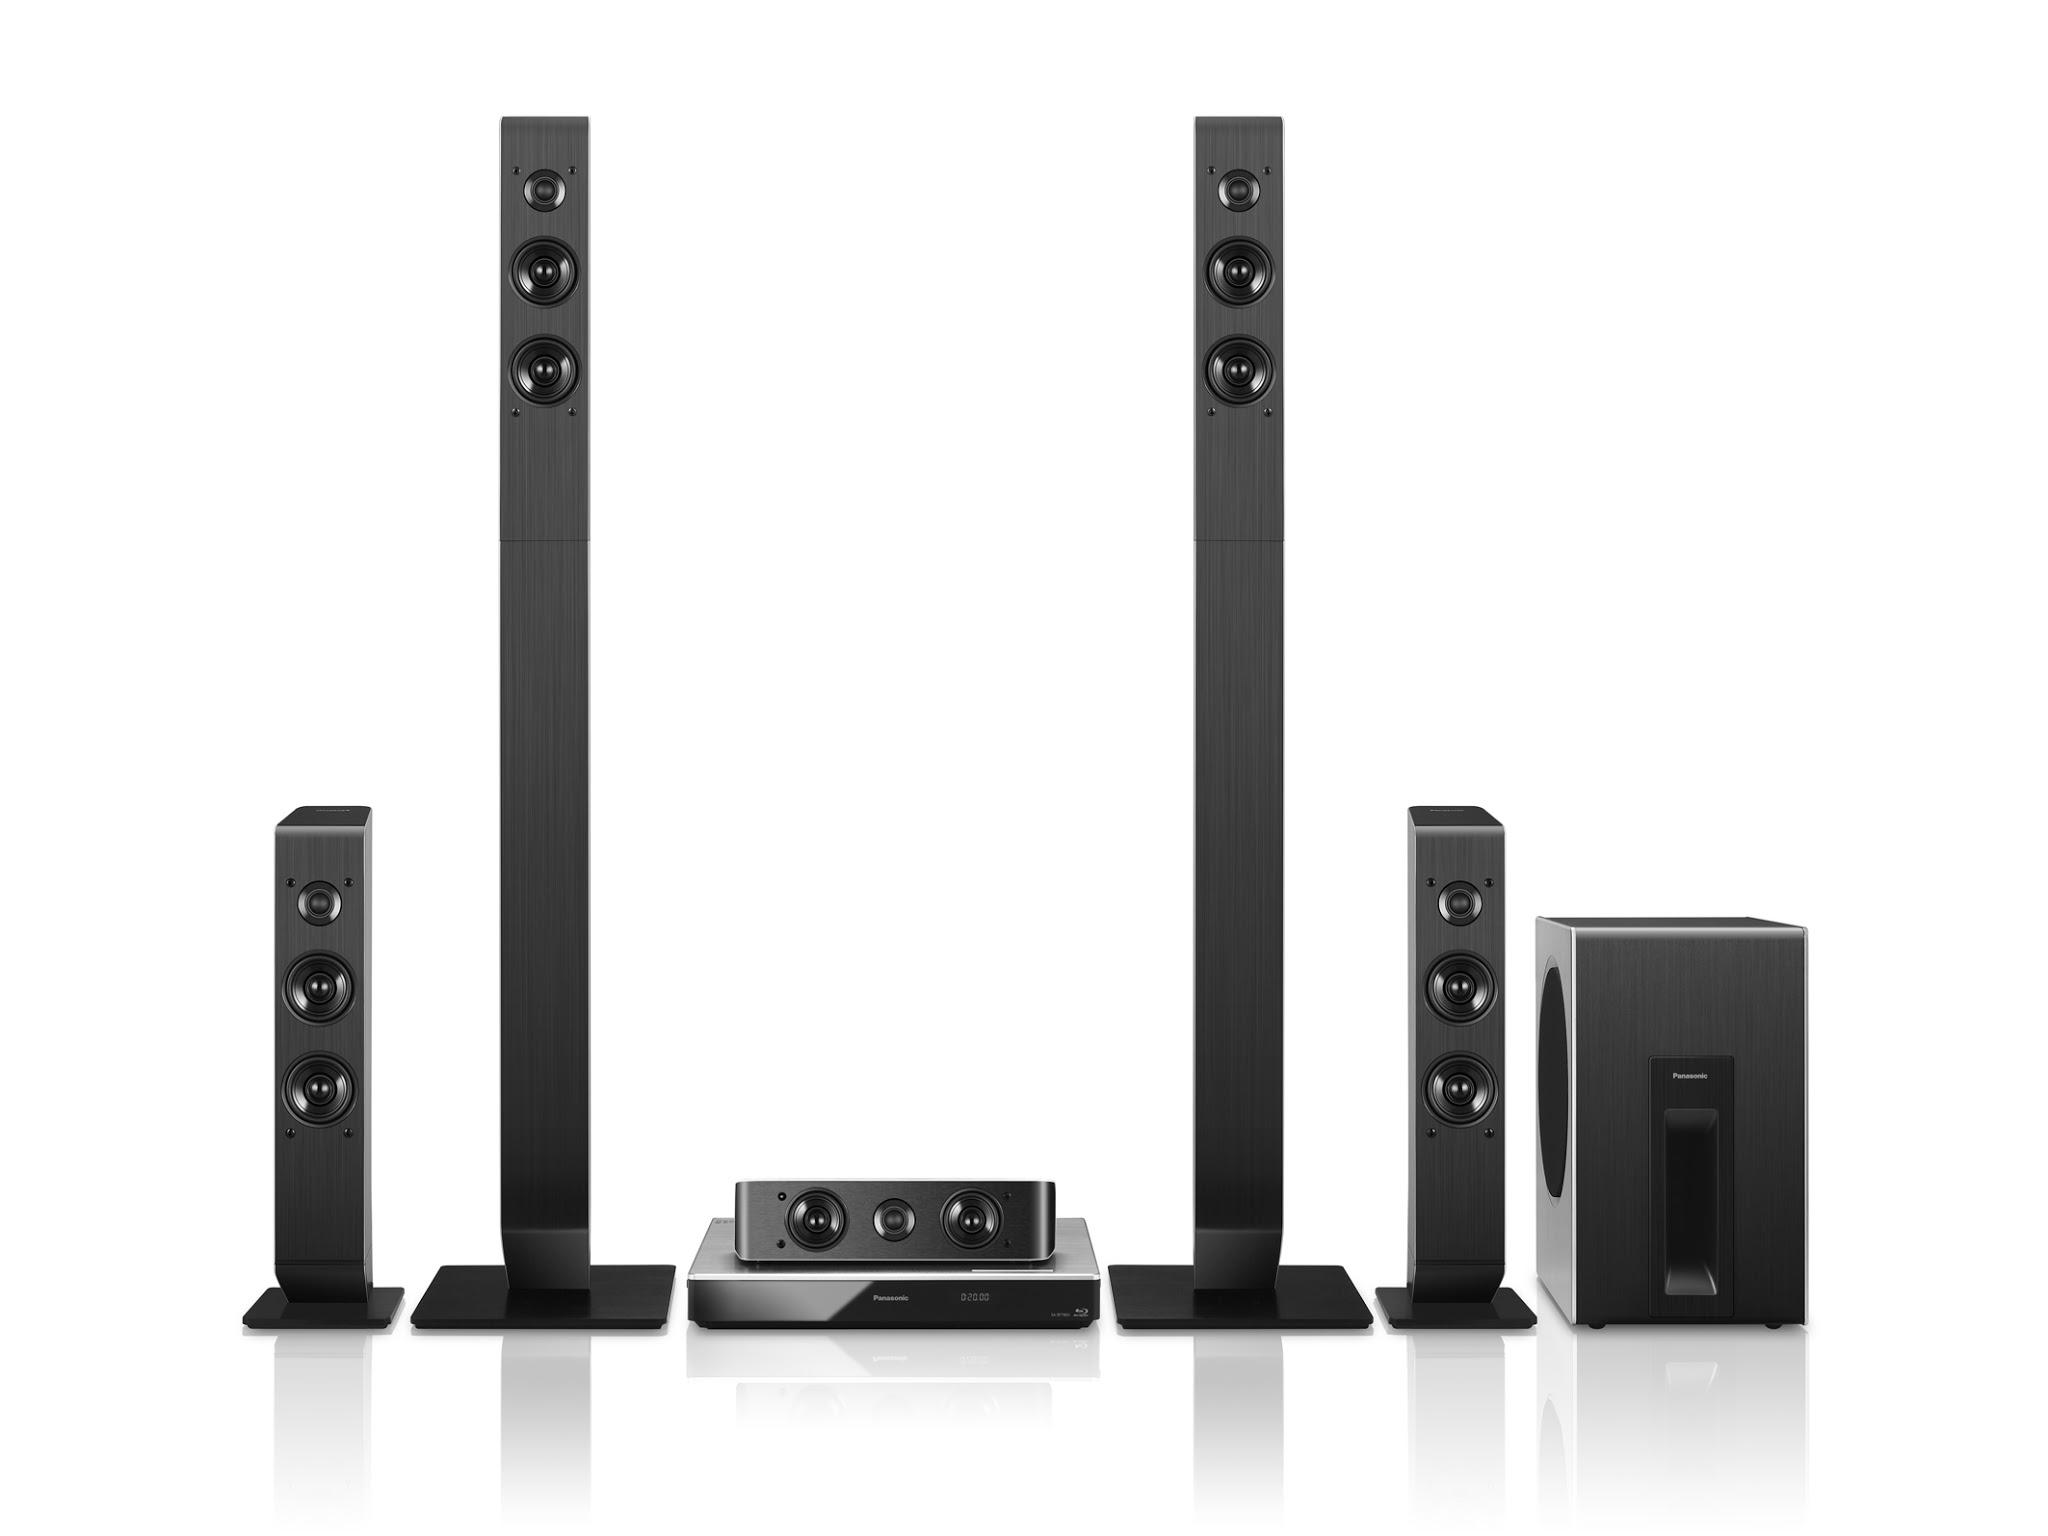 Panasonic SC-BTT865 und SC-BTT505: Neue 4k Blu-ray Komplettsysteme